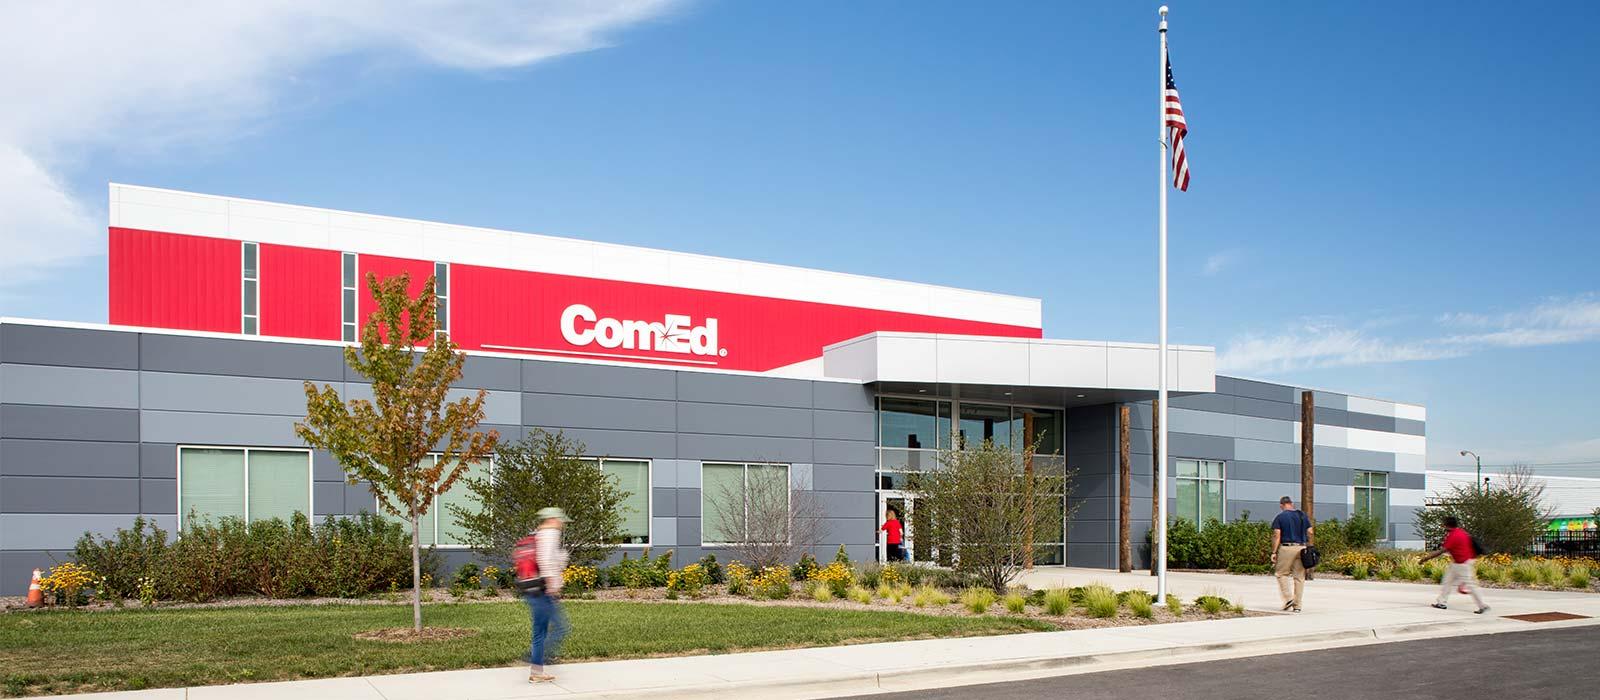 Comed Training Center